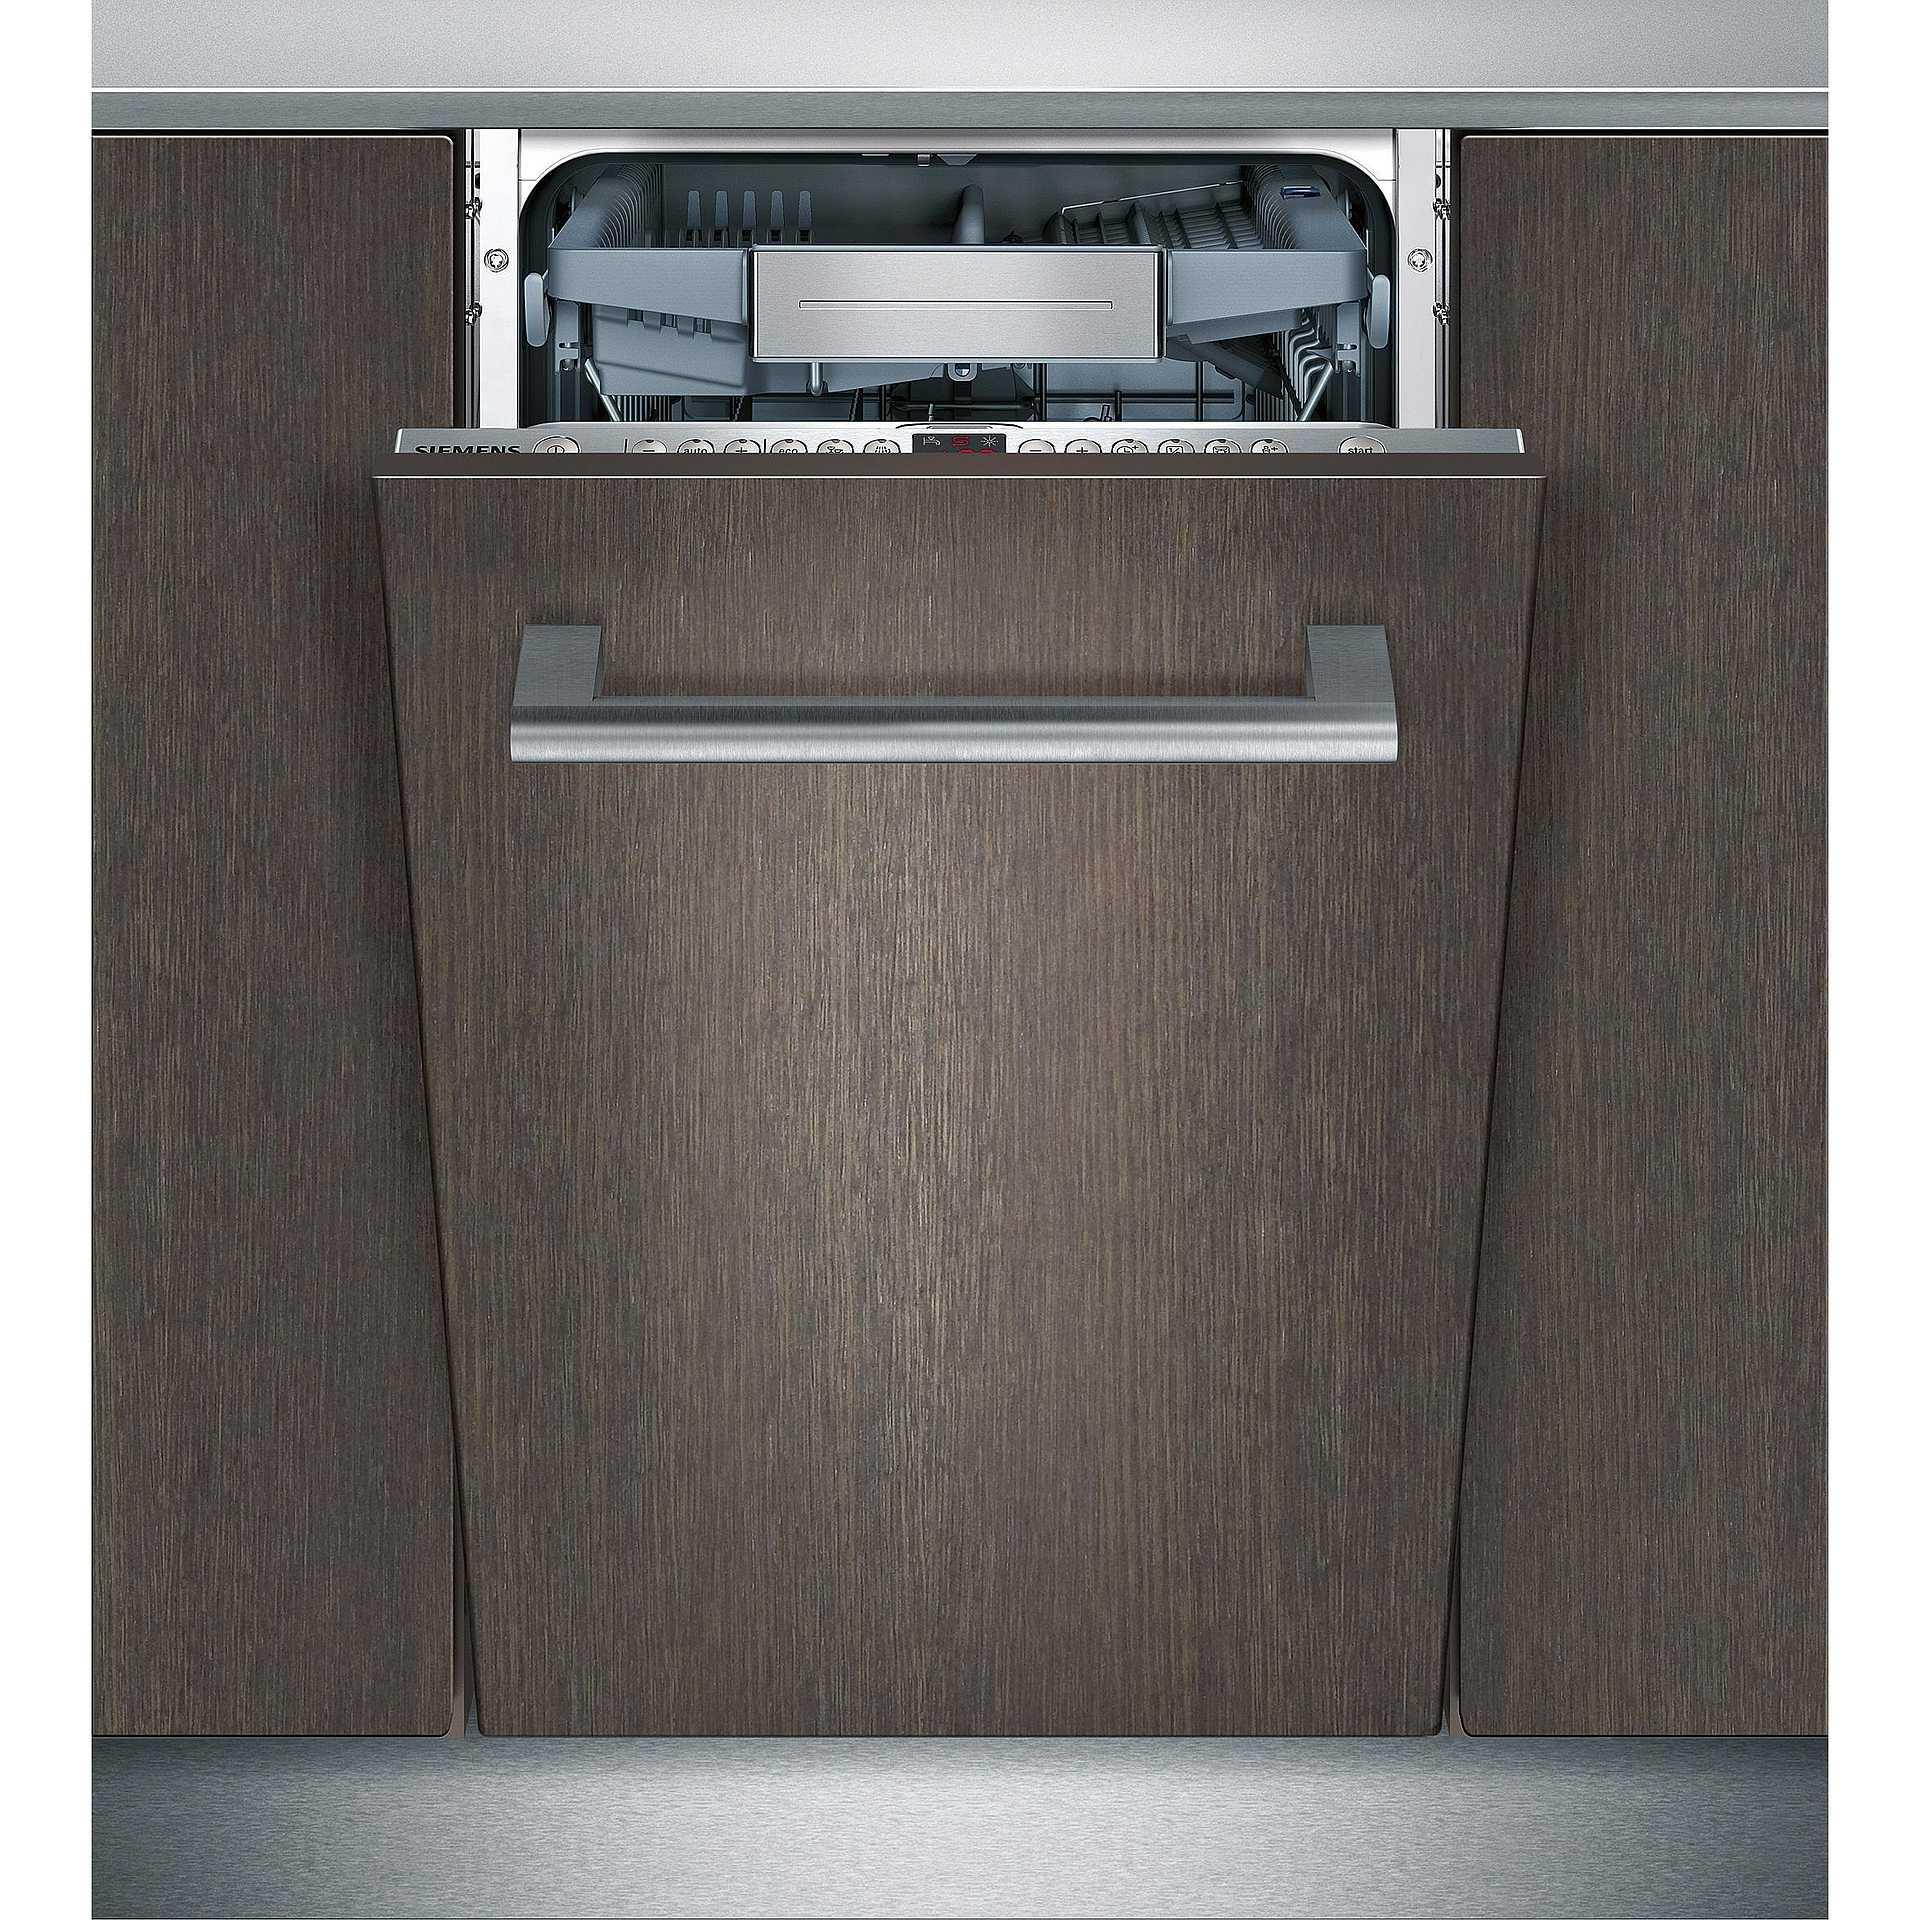 Siemens SR76T091EU lavastoviglie da incasso 45 cm 10 coperti Classe ...